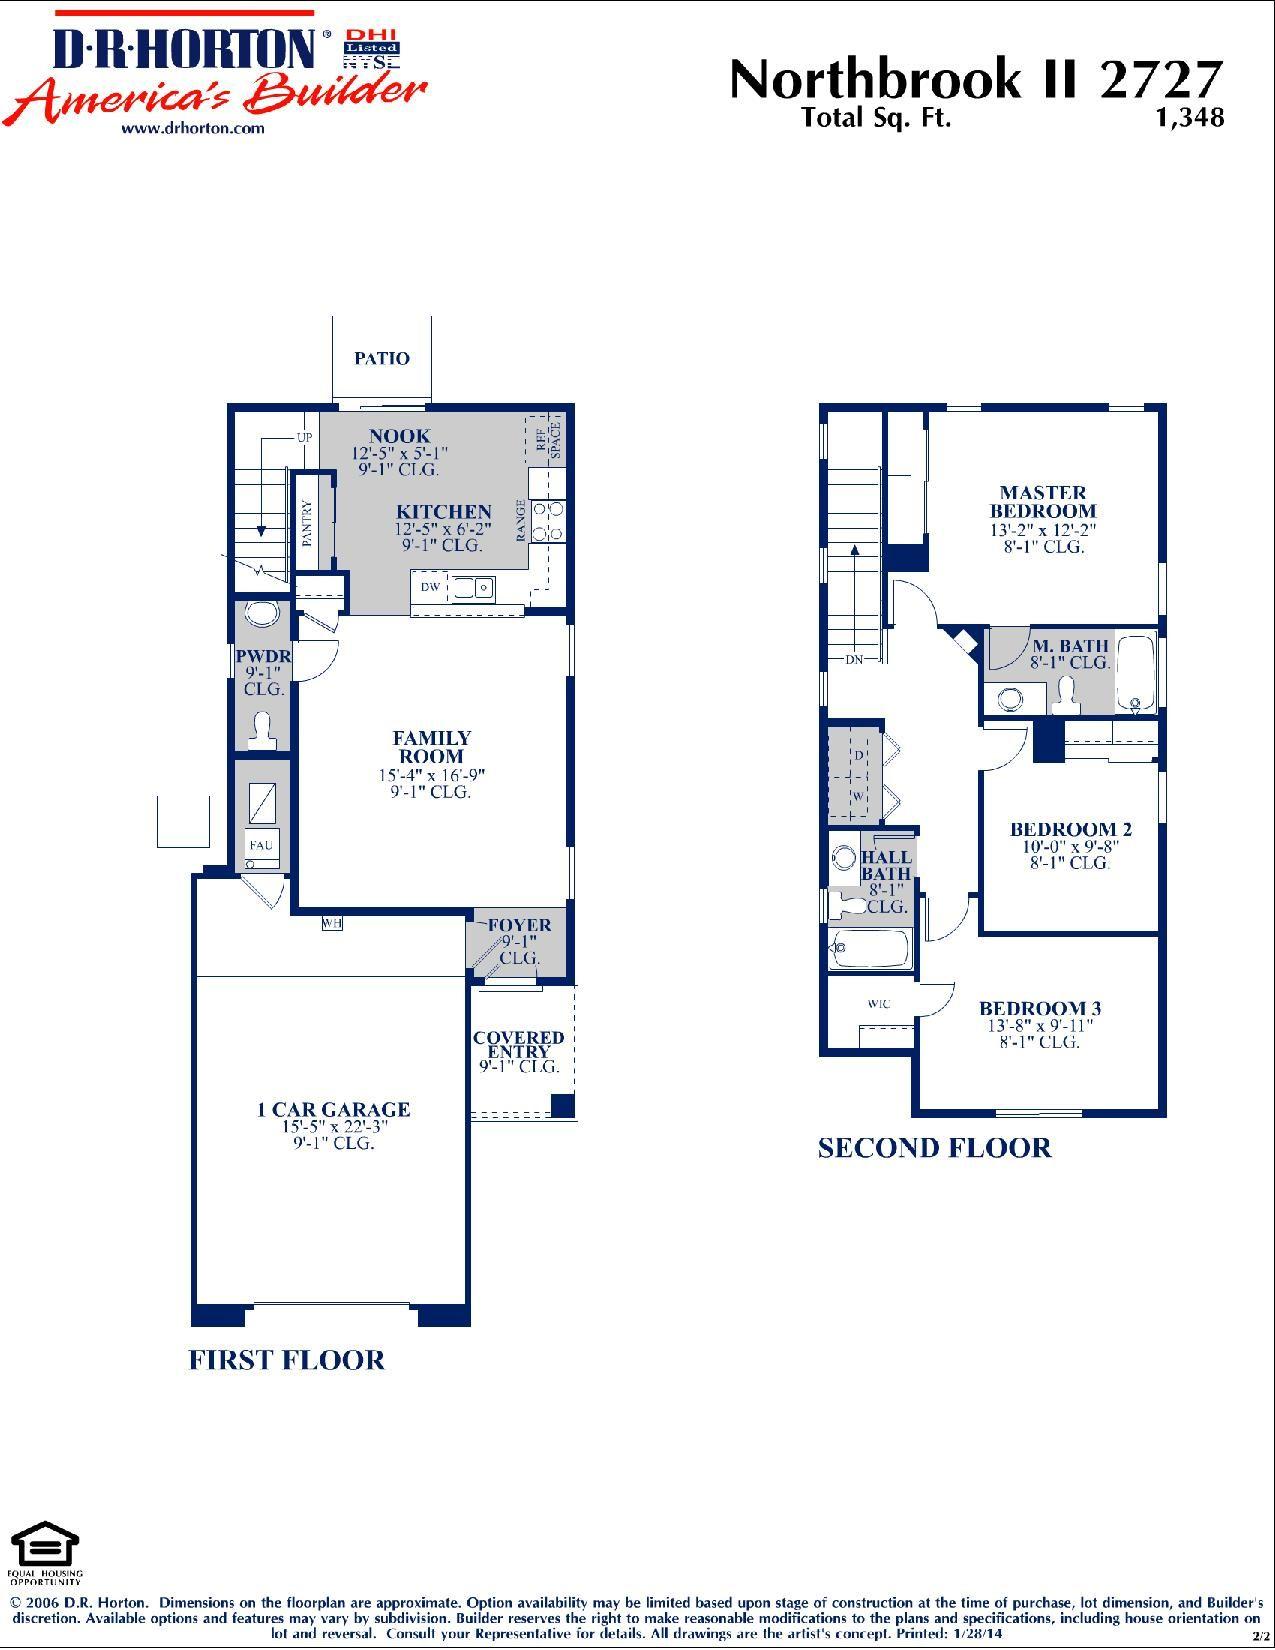 DR Horton Northbrook II Floor Plan Via Www.nmhometeam.com